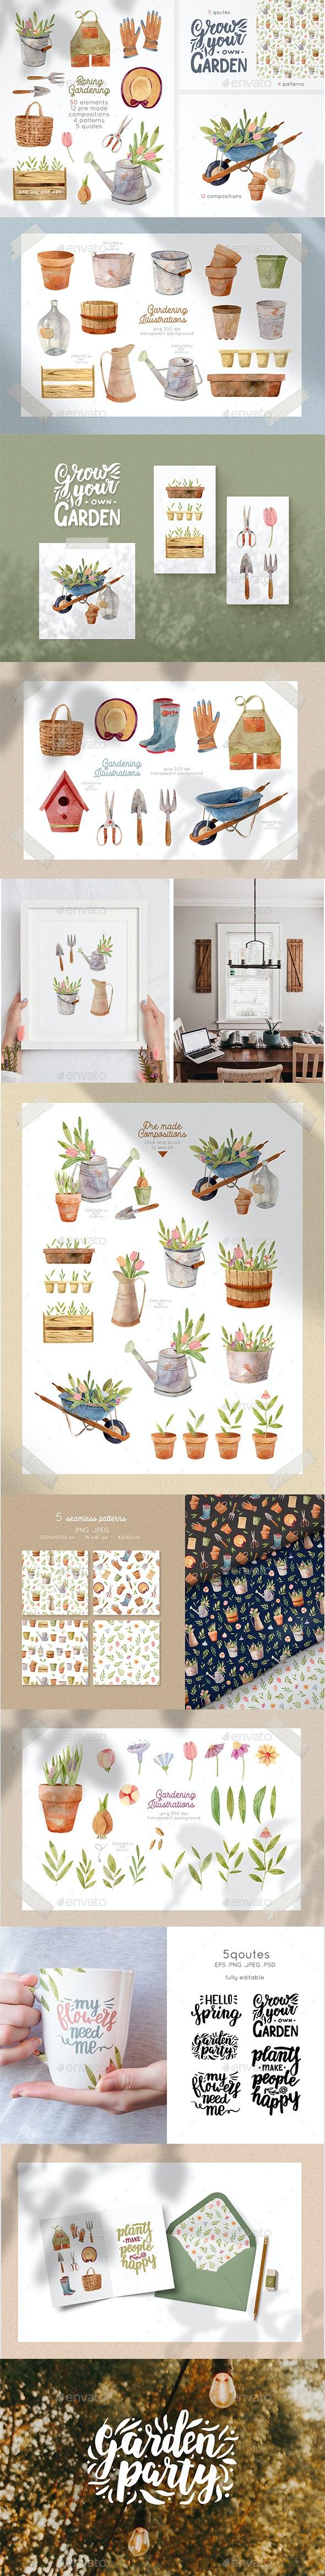 Gardening Tools Clipart - Illustrations Graphics